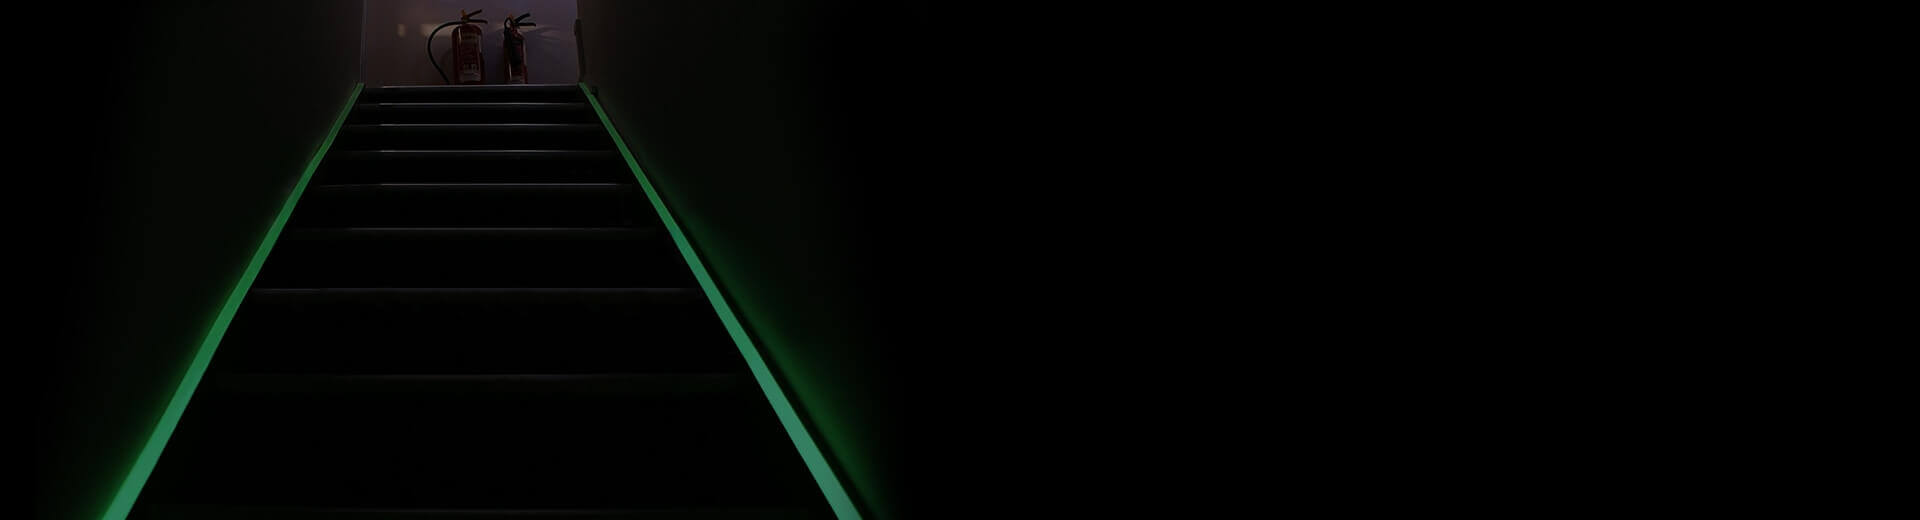 Pásky svietiace v tme